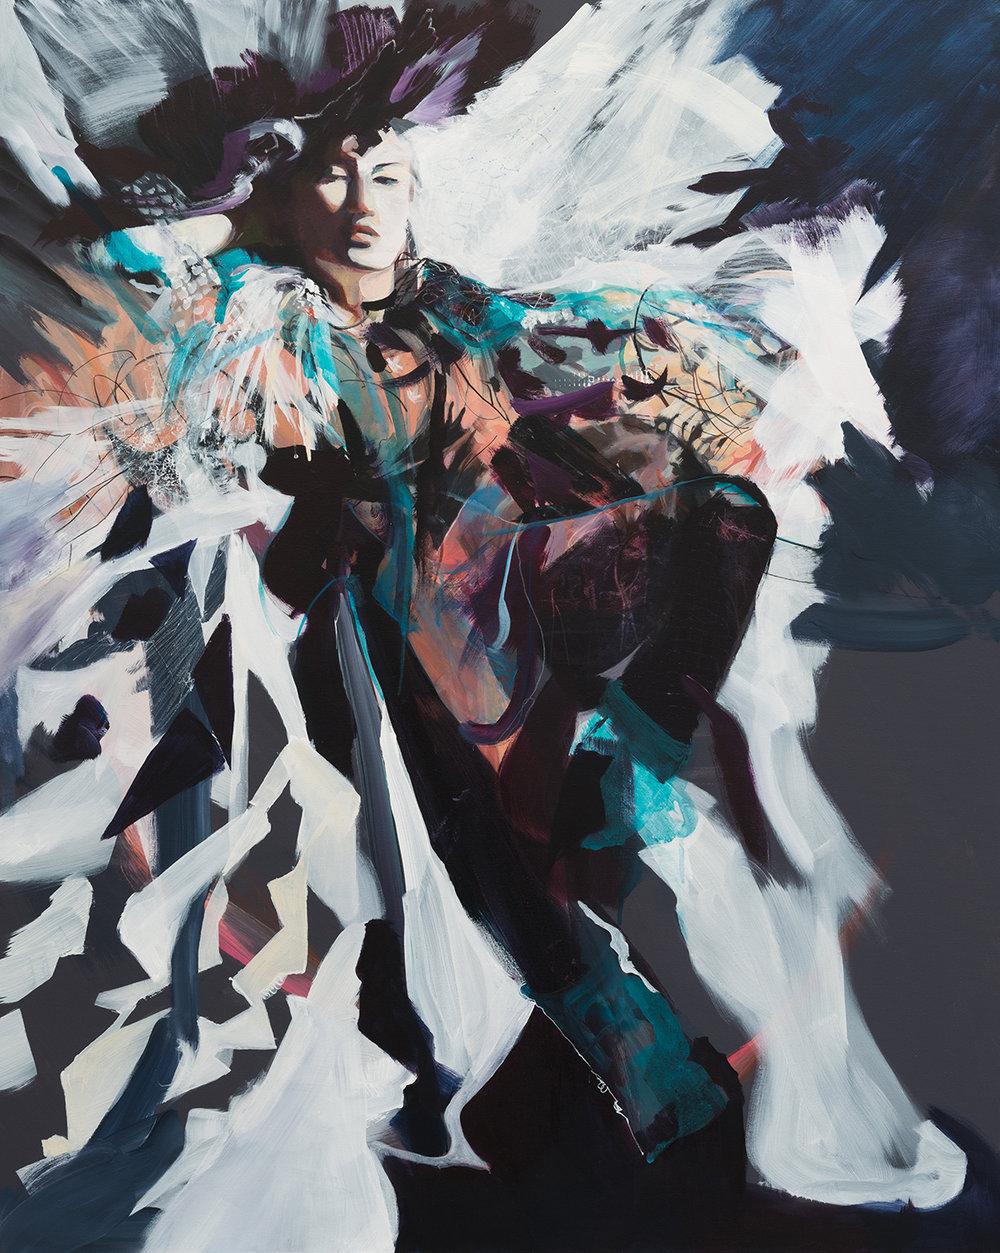 JaneDenman-acryliconcanvas-winterdance-1mx80cm-£1200.jpg